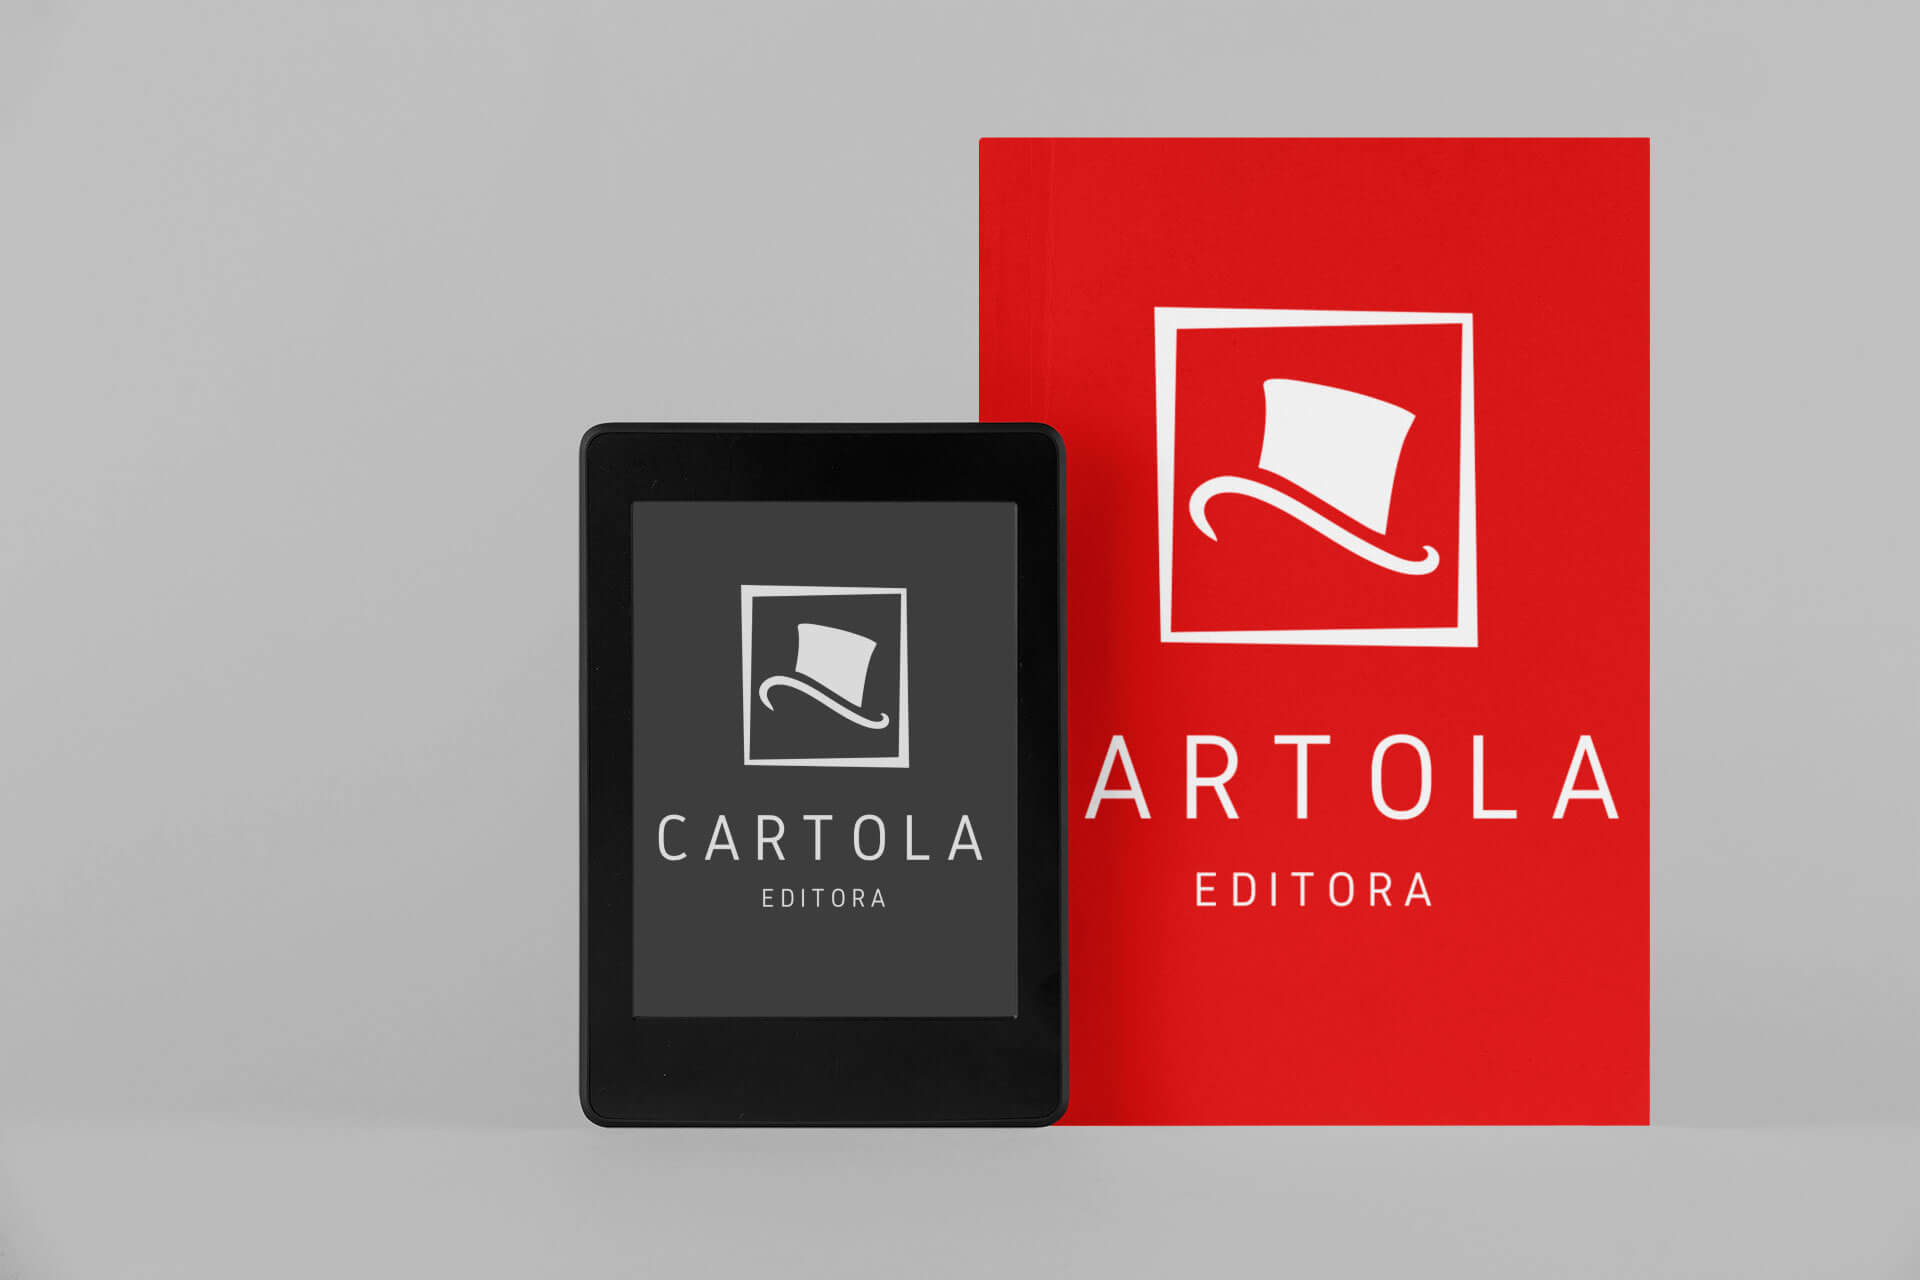 Cartola Editora distribuirá E-books de forma gratuita